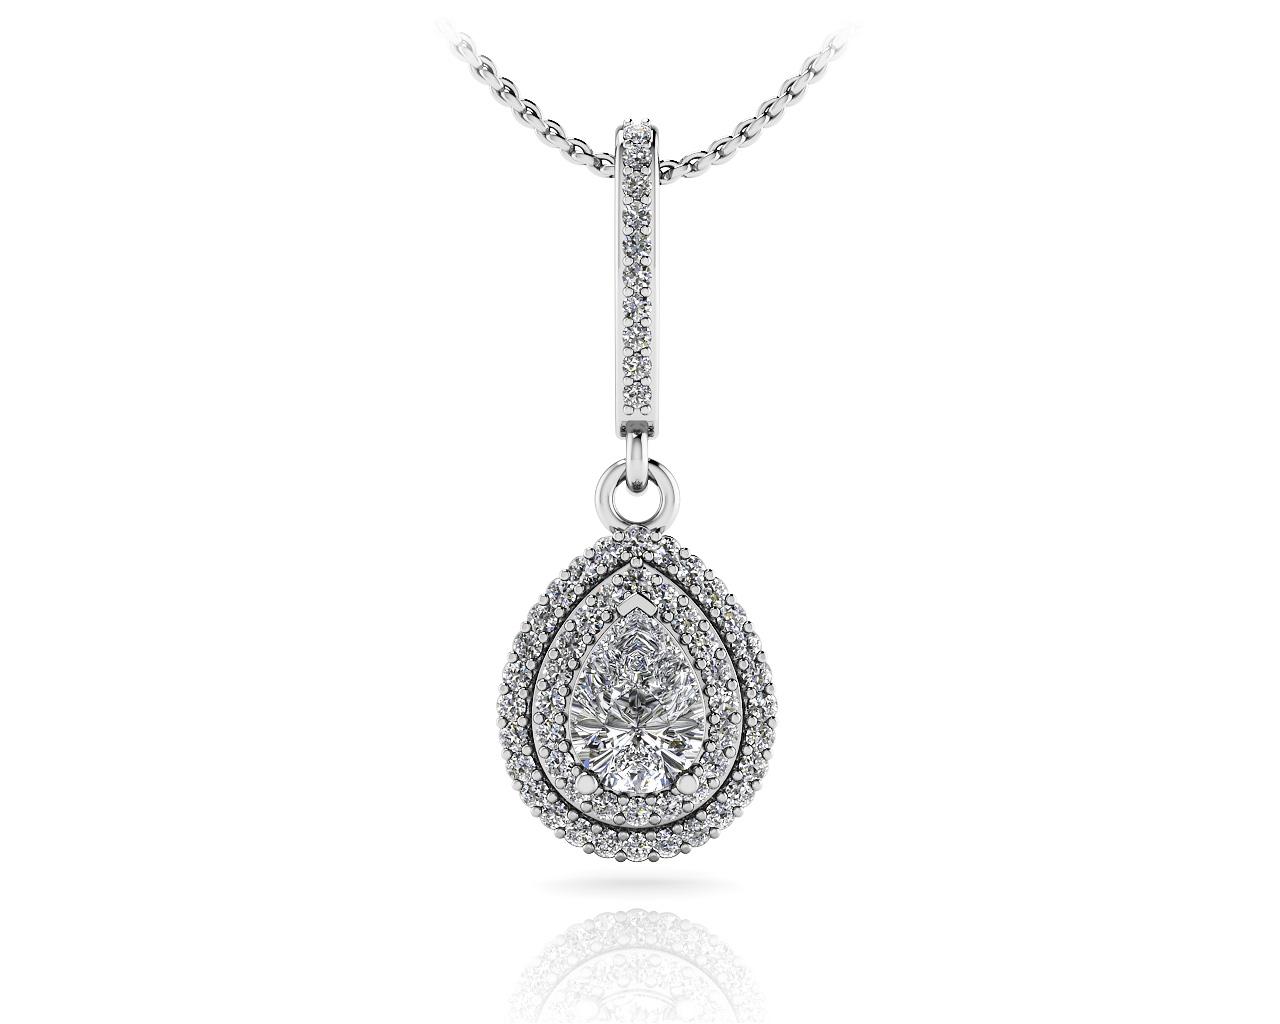 Vintage Teardrop Diamond Pendant Roco39s Jewelry